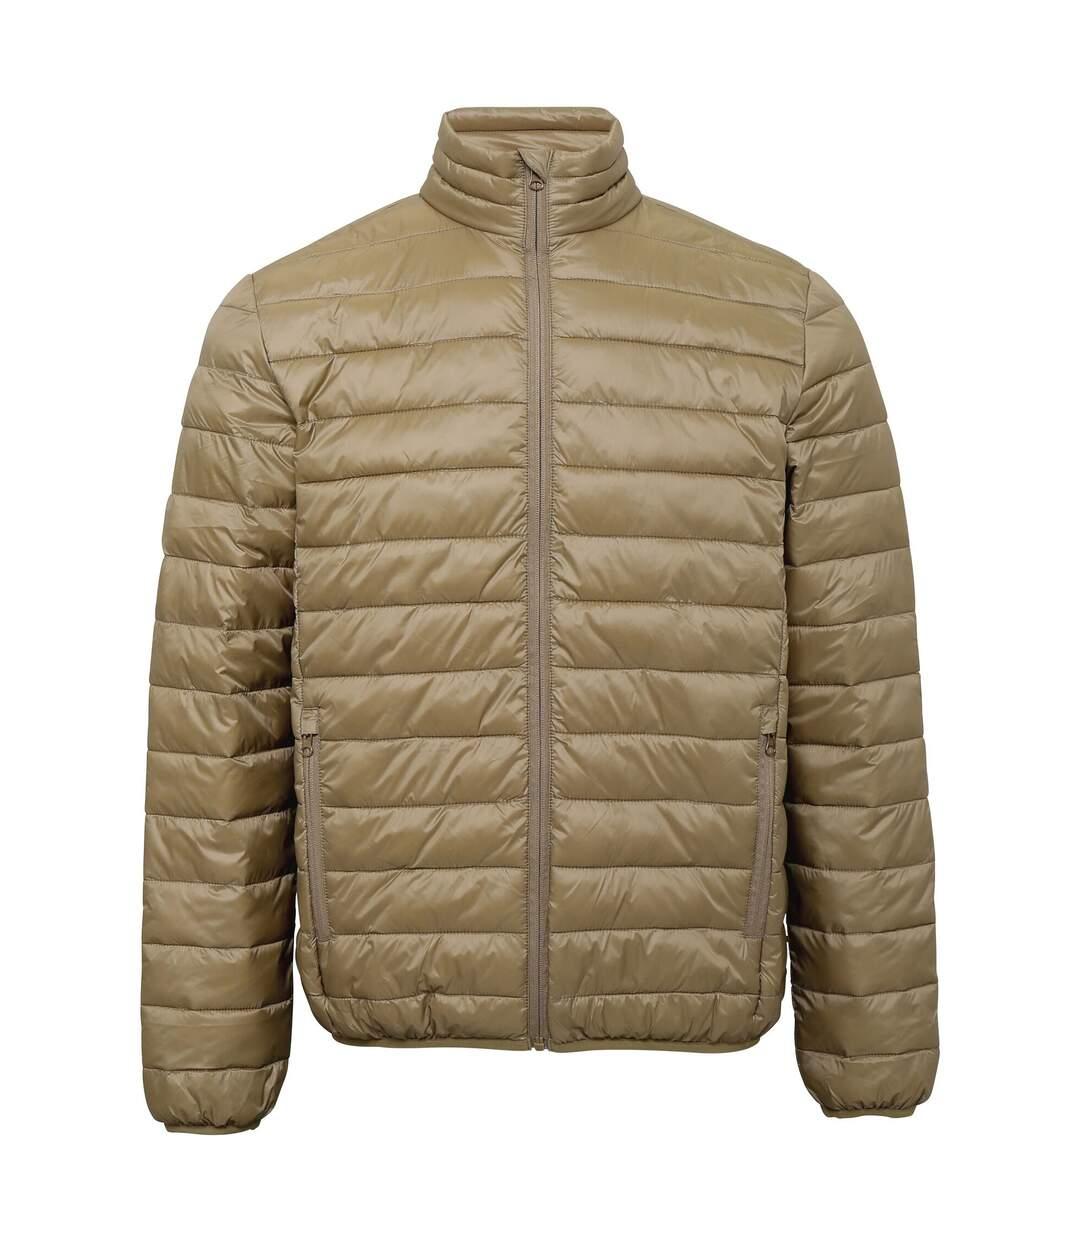 2786 Mens Terrain Long Sleeves Padded Jacket (Khaki) - UTRW6282